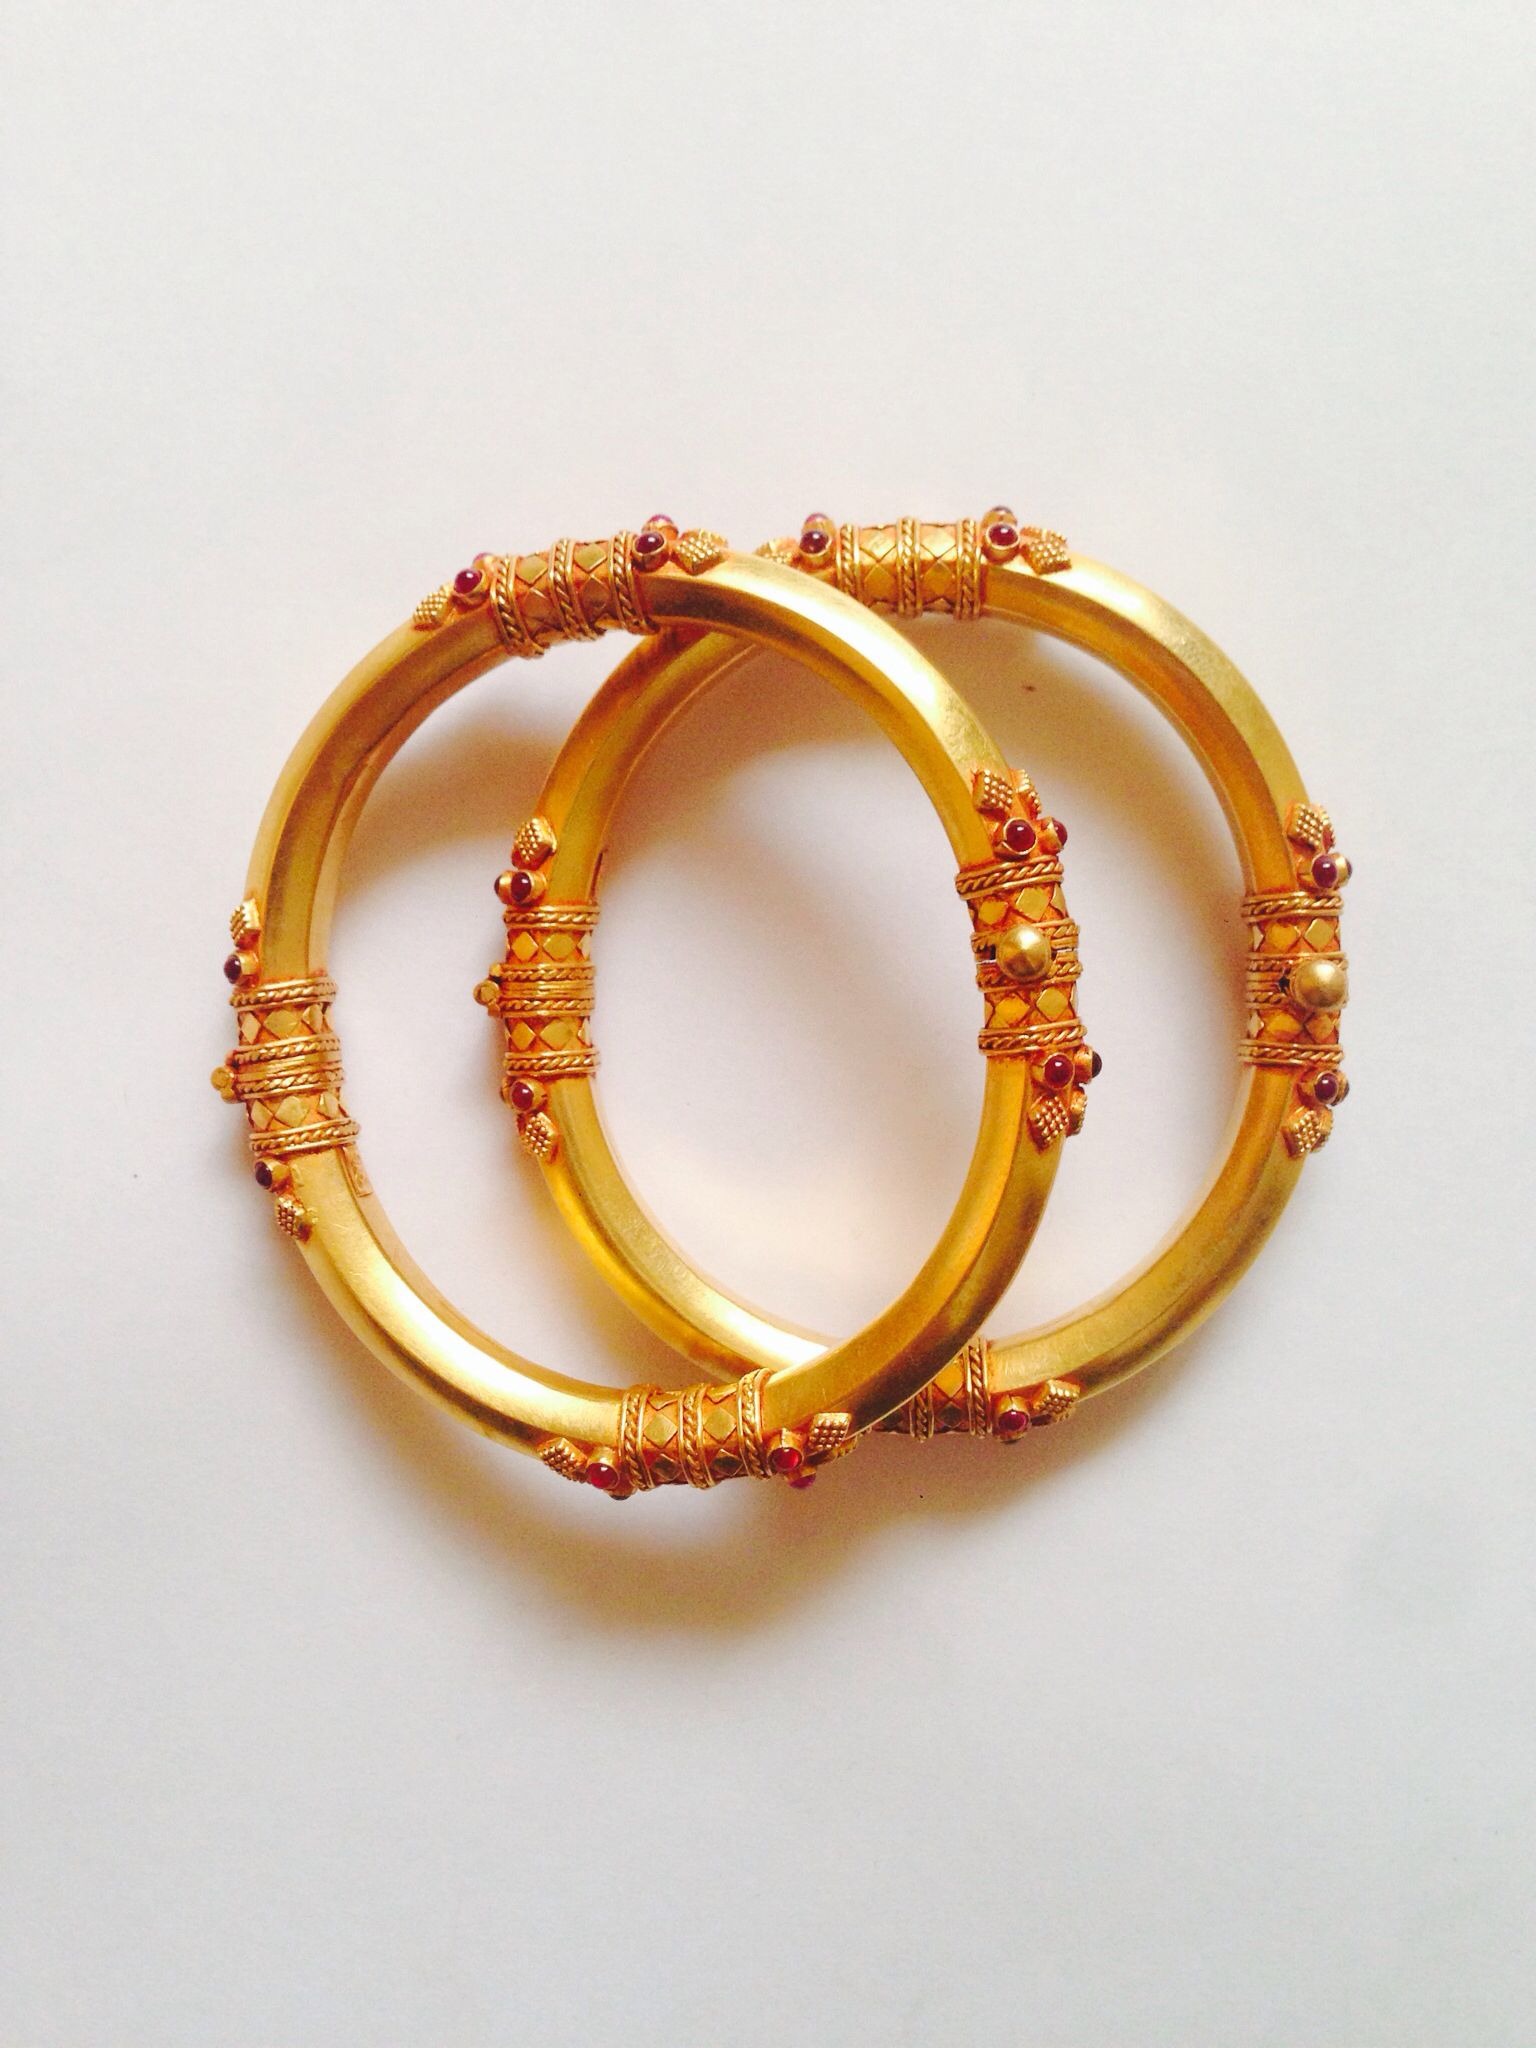 Antique Handmade Bangle | Bangles designs | Bangles, Gold ...